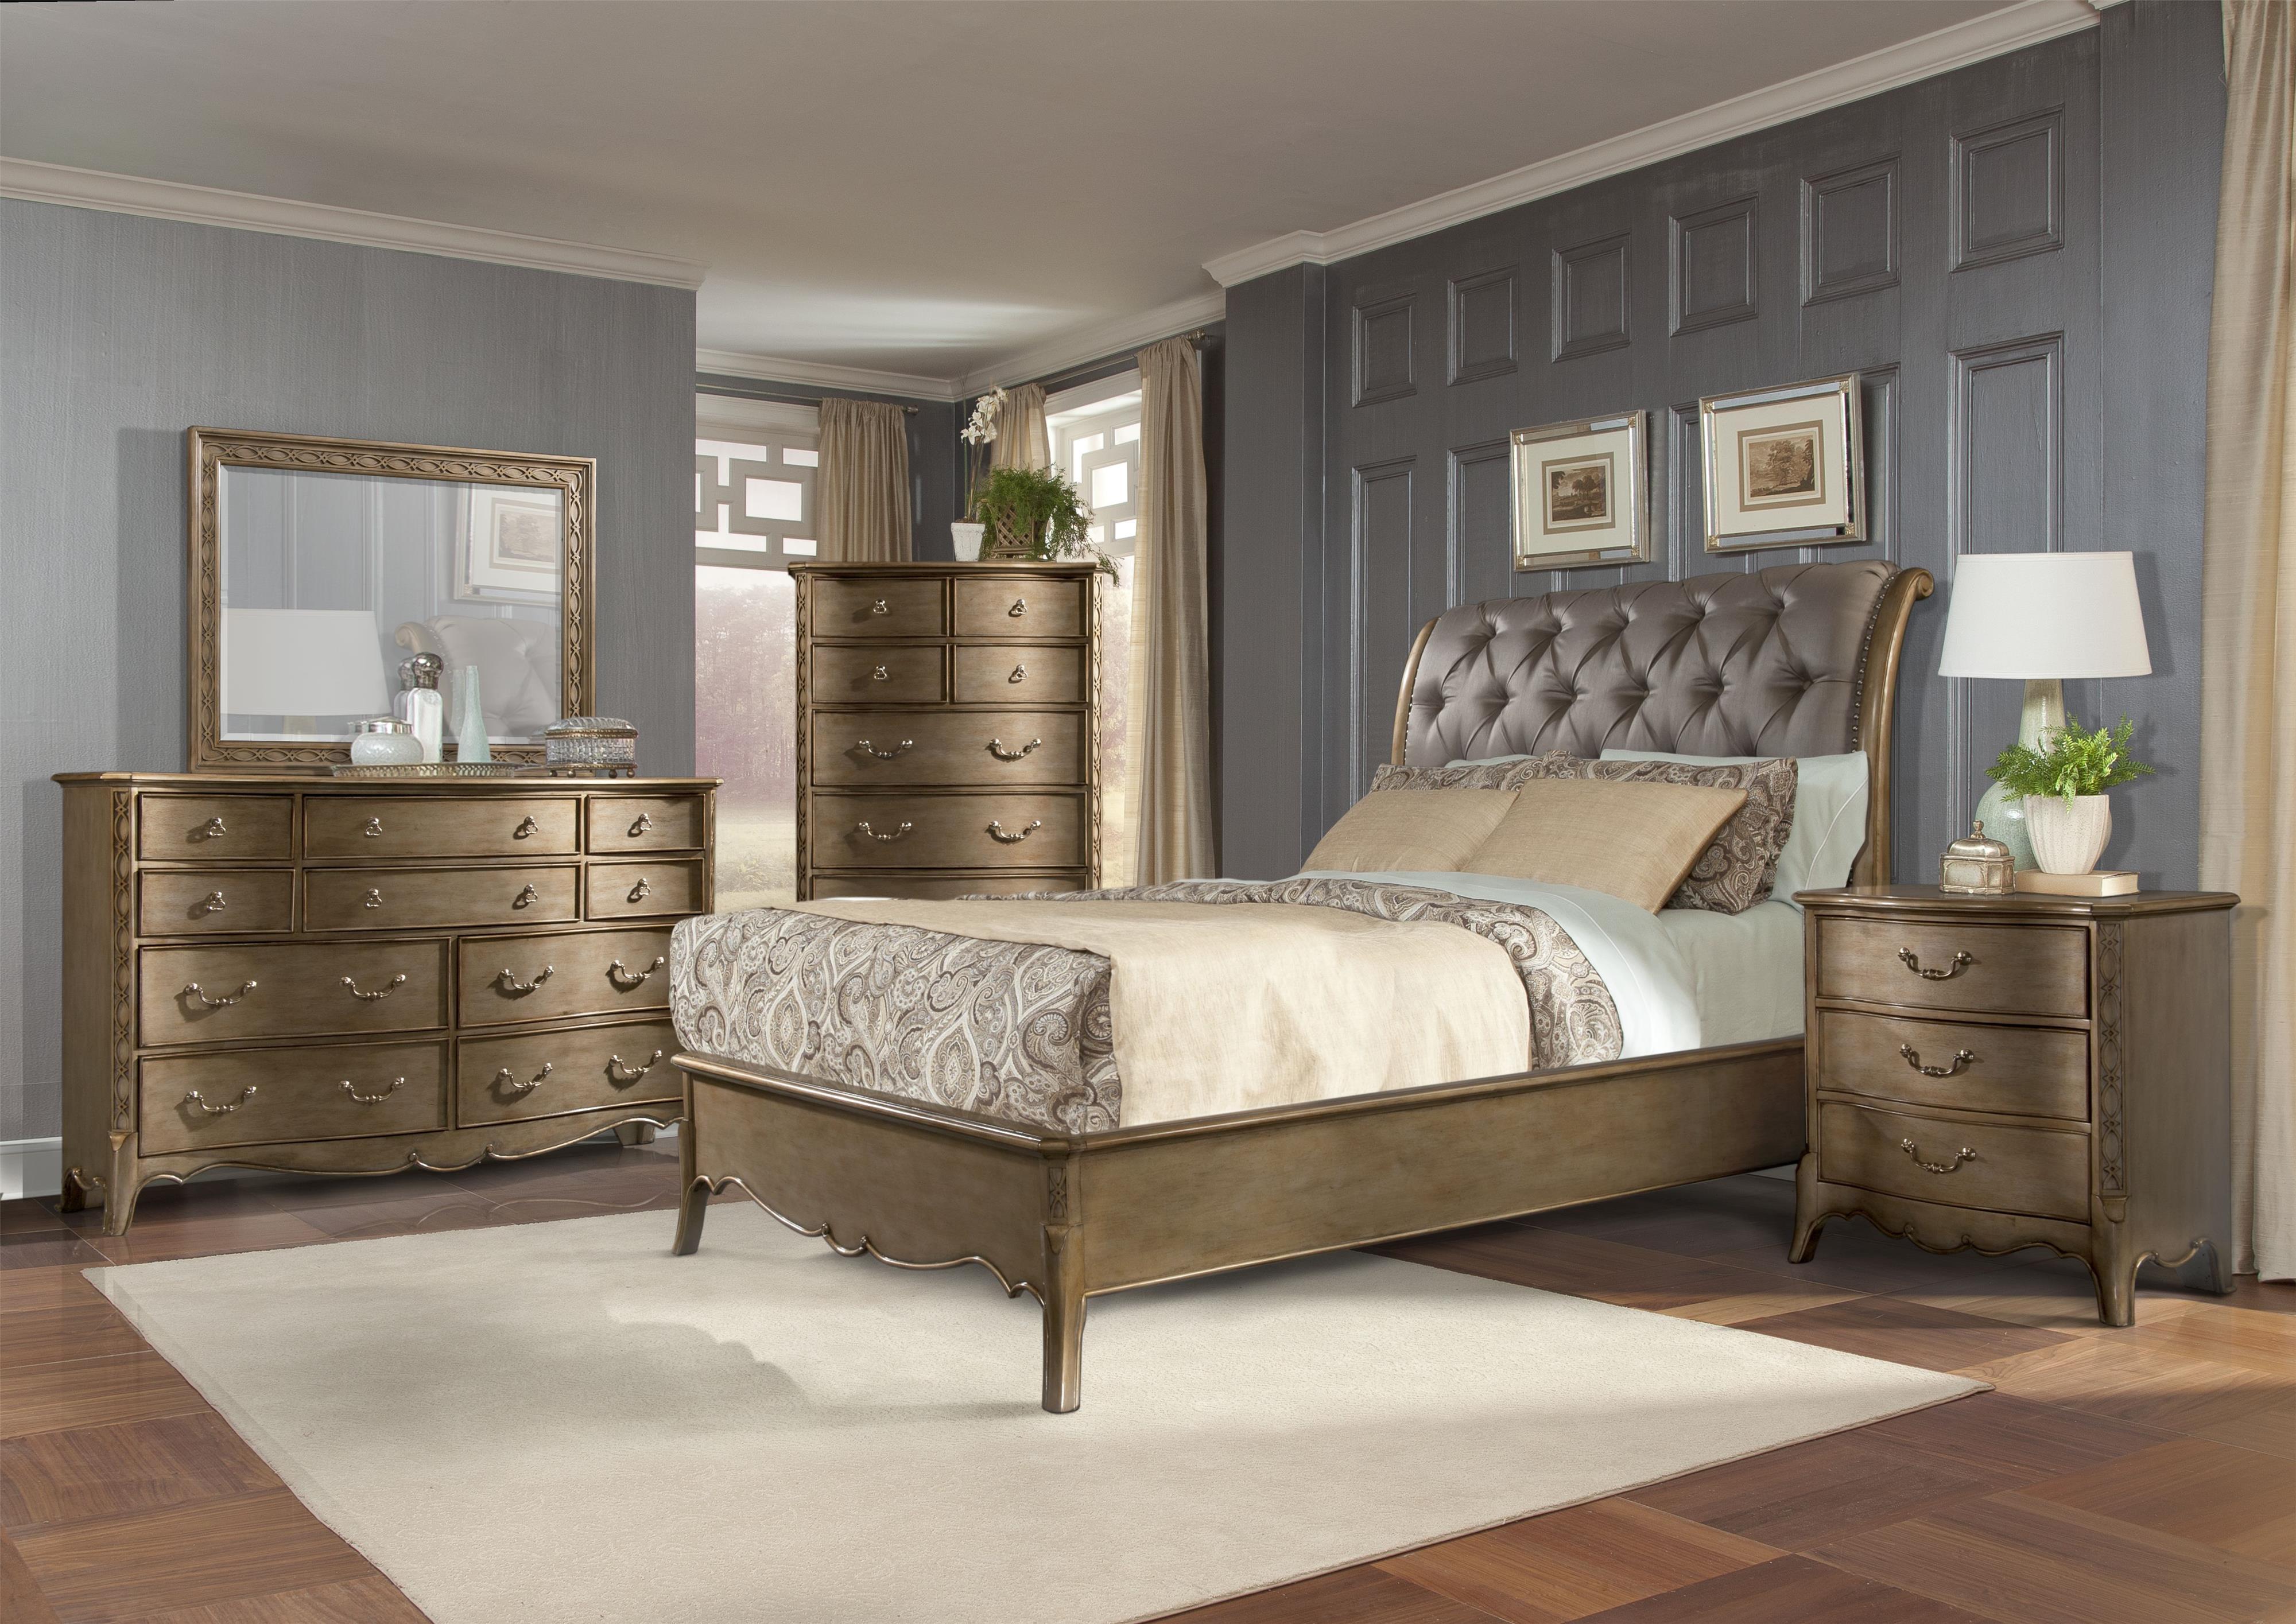 Homelegance Chambord Queen Bedroom Group - Item Number: 1828 Q Bedroom Group 1